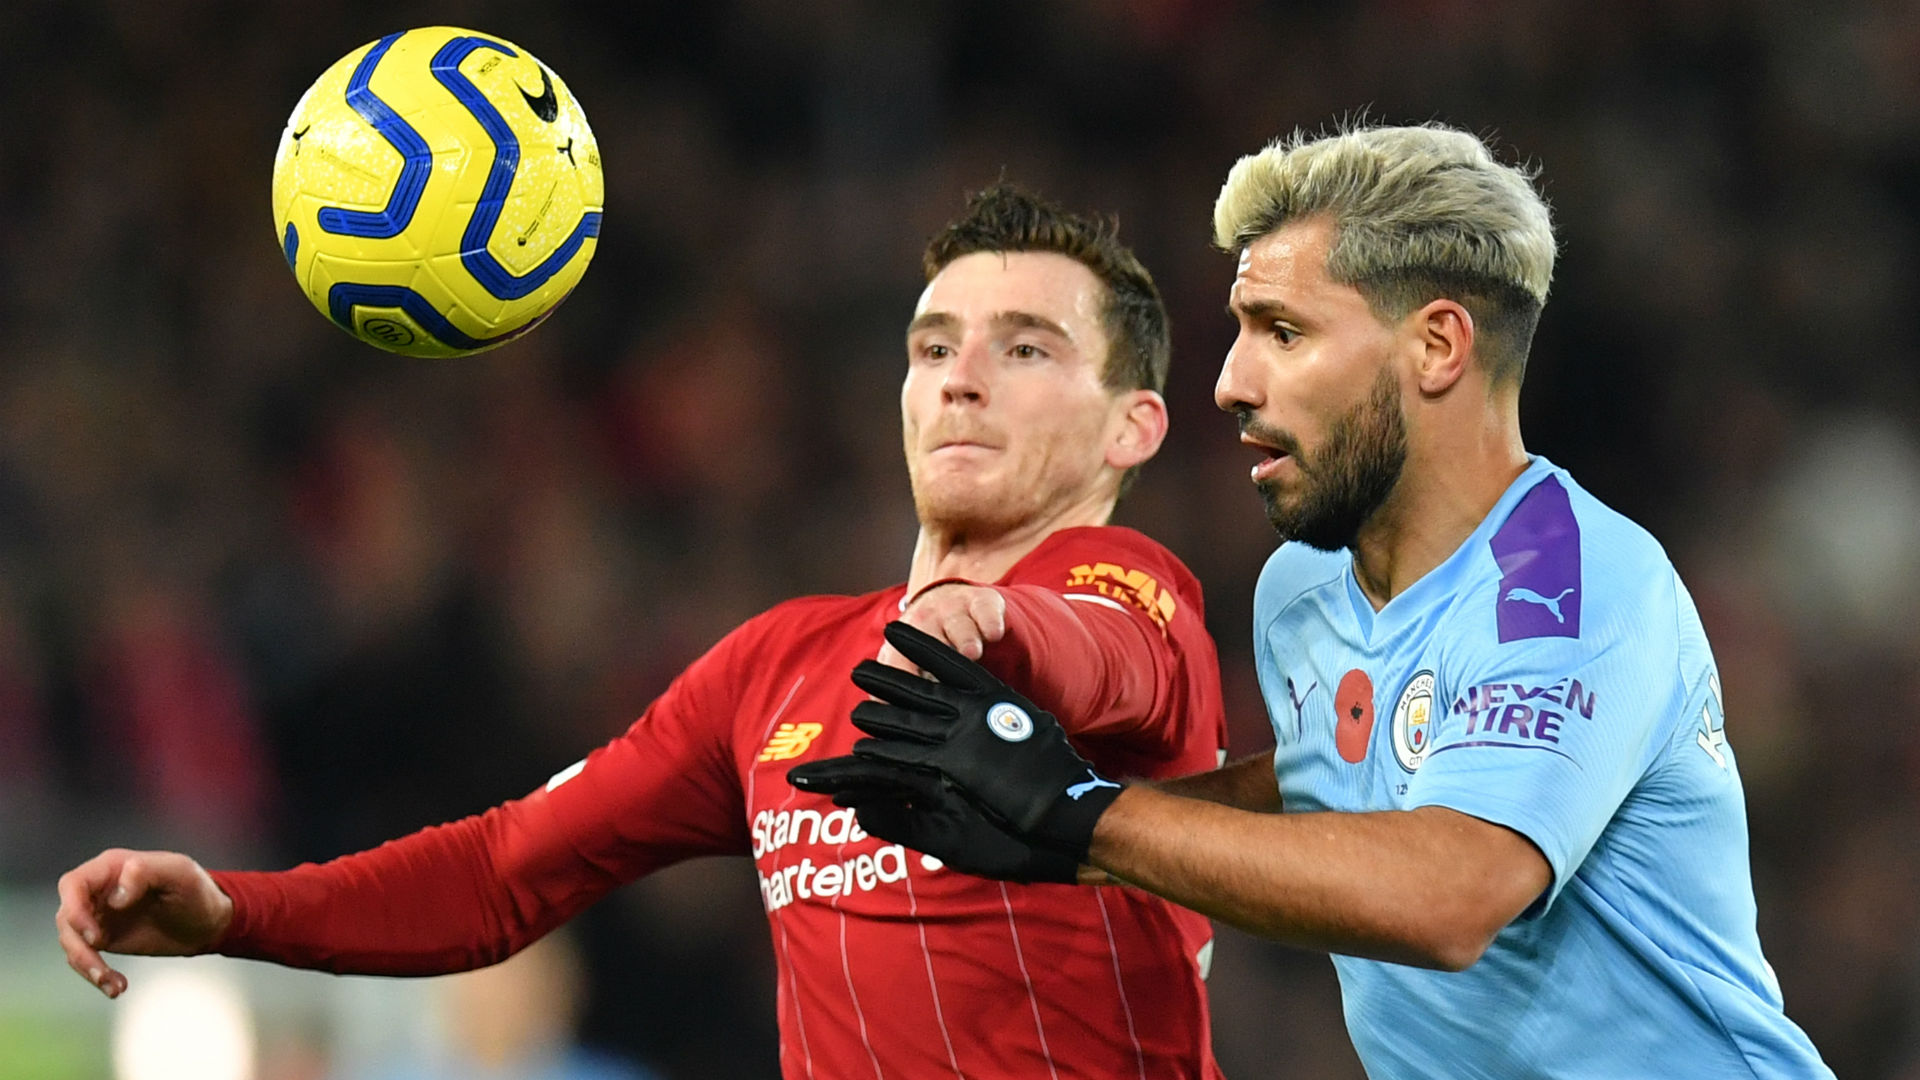 Andy Robertson Sergio Aguero Liverpool Manchester City 2019-20